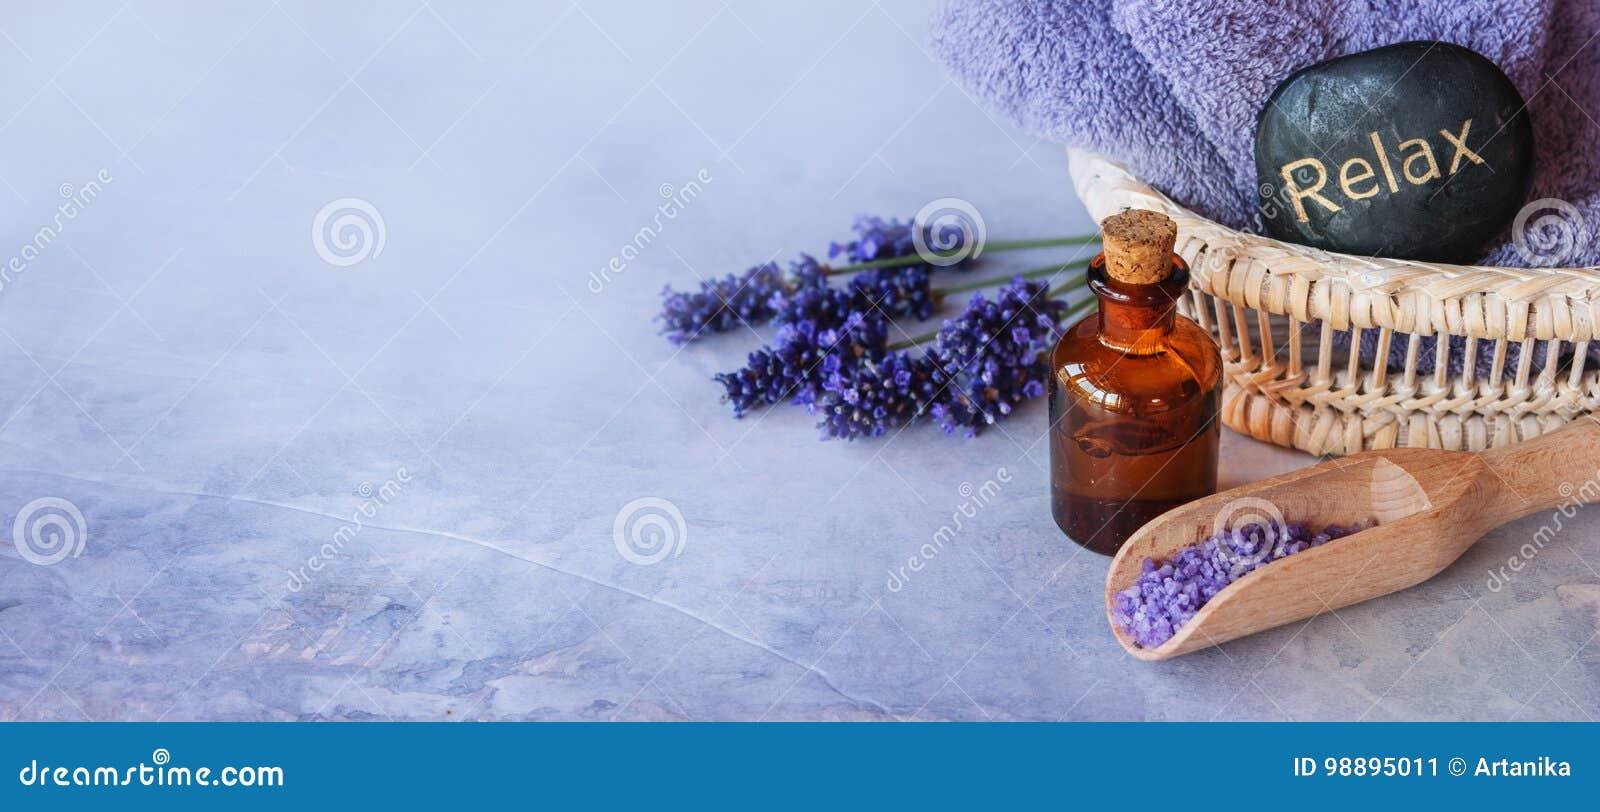 Lavender essential oil spa